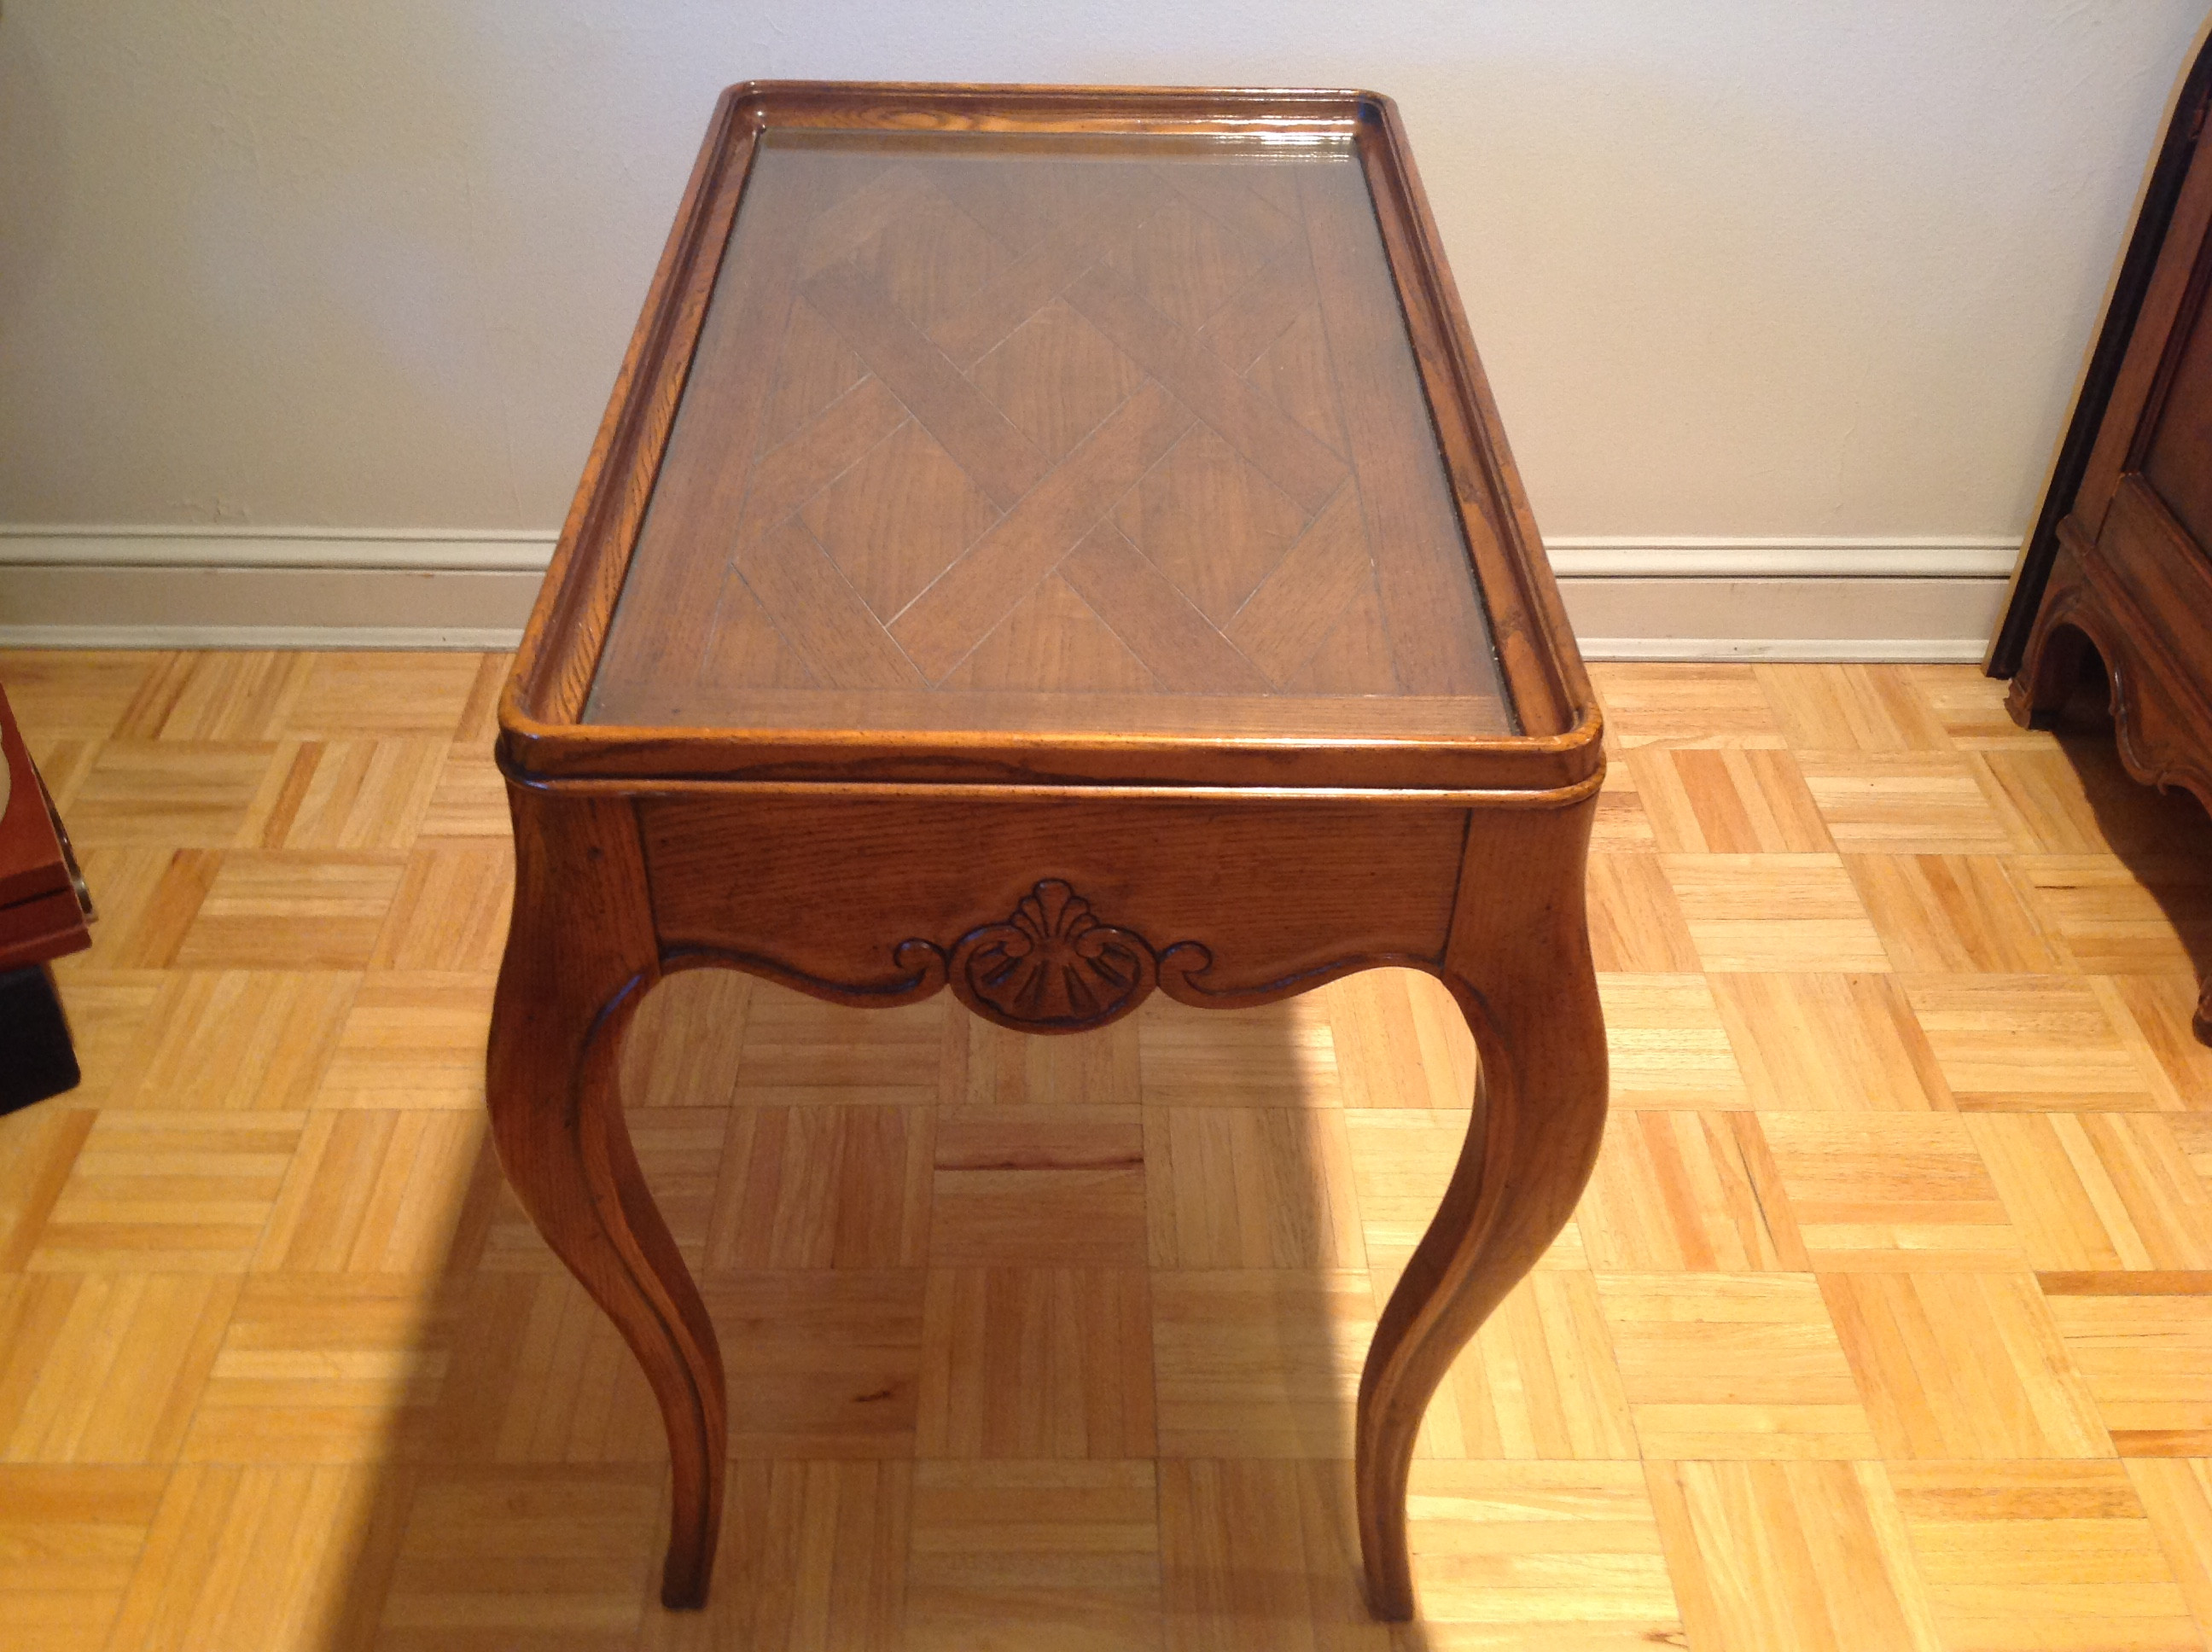 Baker Furniture Wood Side Table w/ Mirror Insert